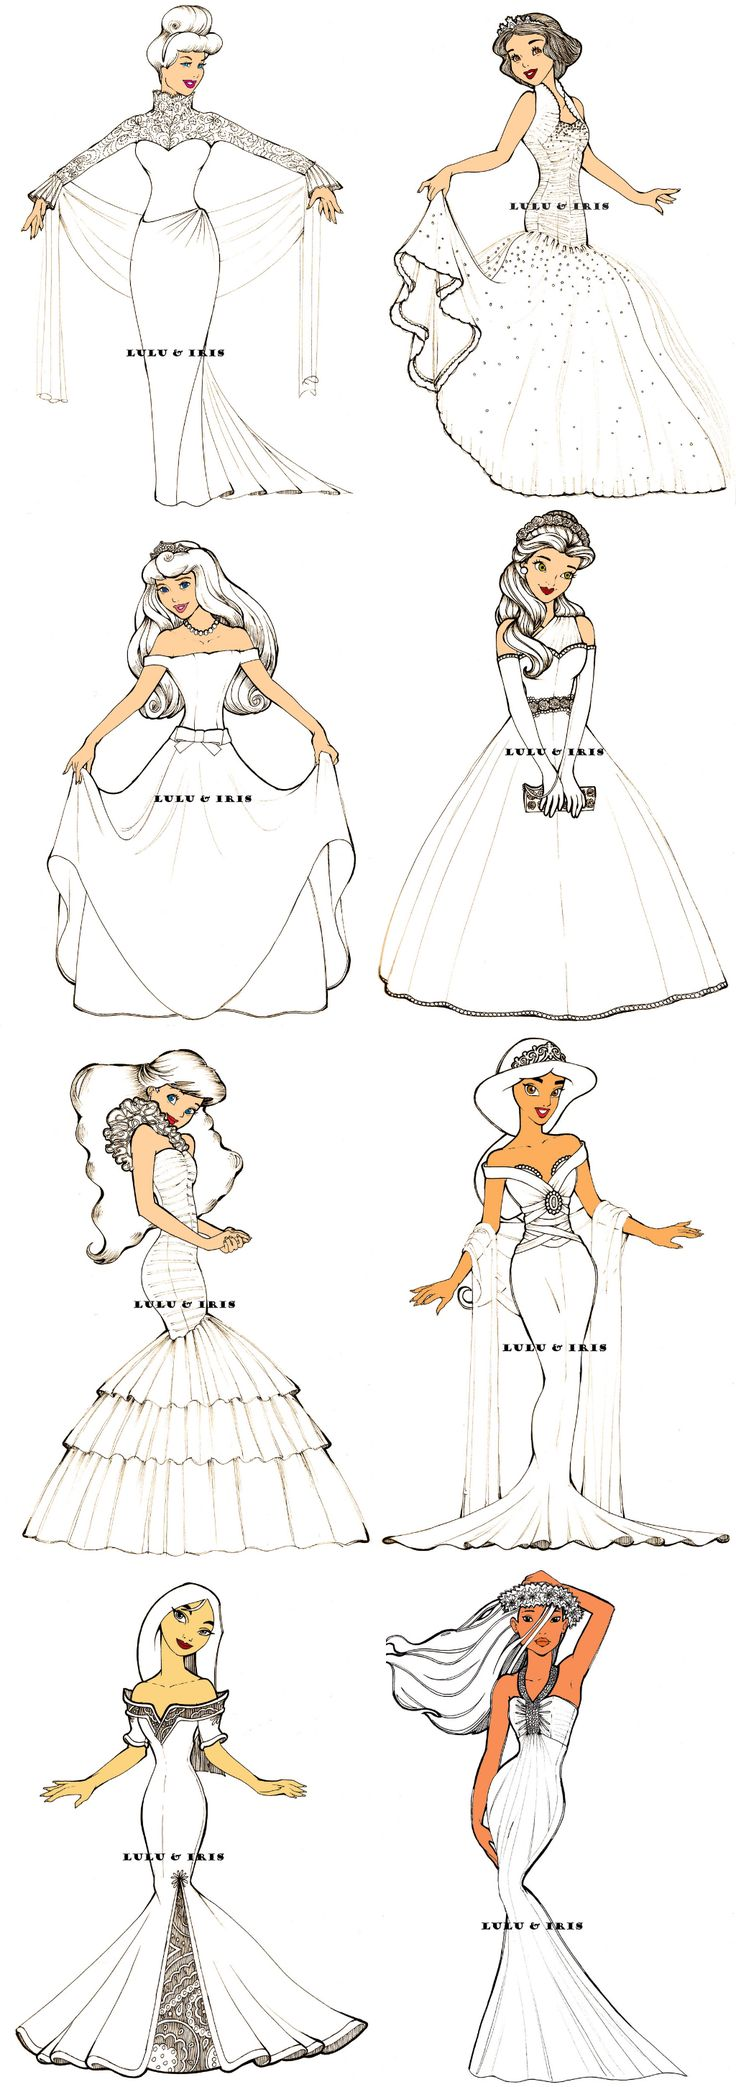 Disney Princess Wedding Dresses by lulu-ibeh.deviantart.com on @deviantART